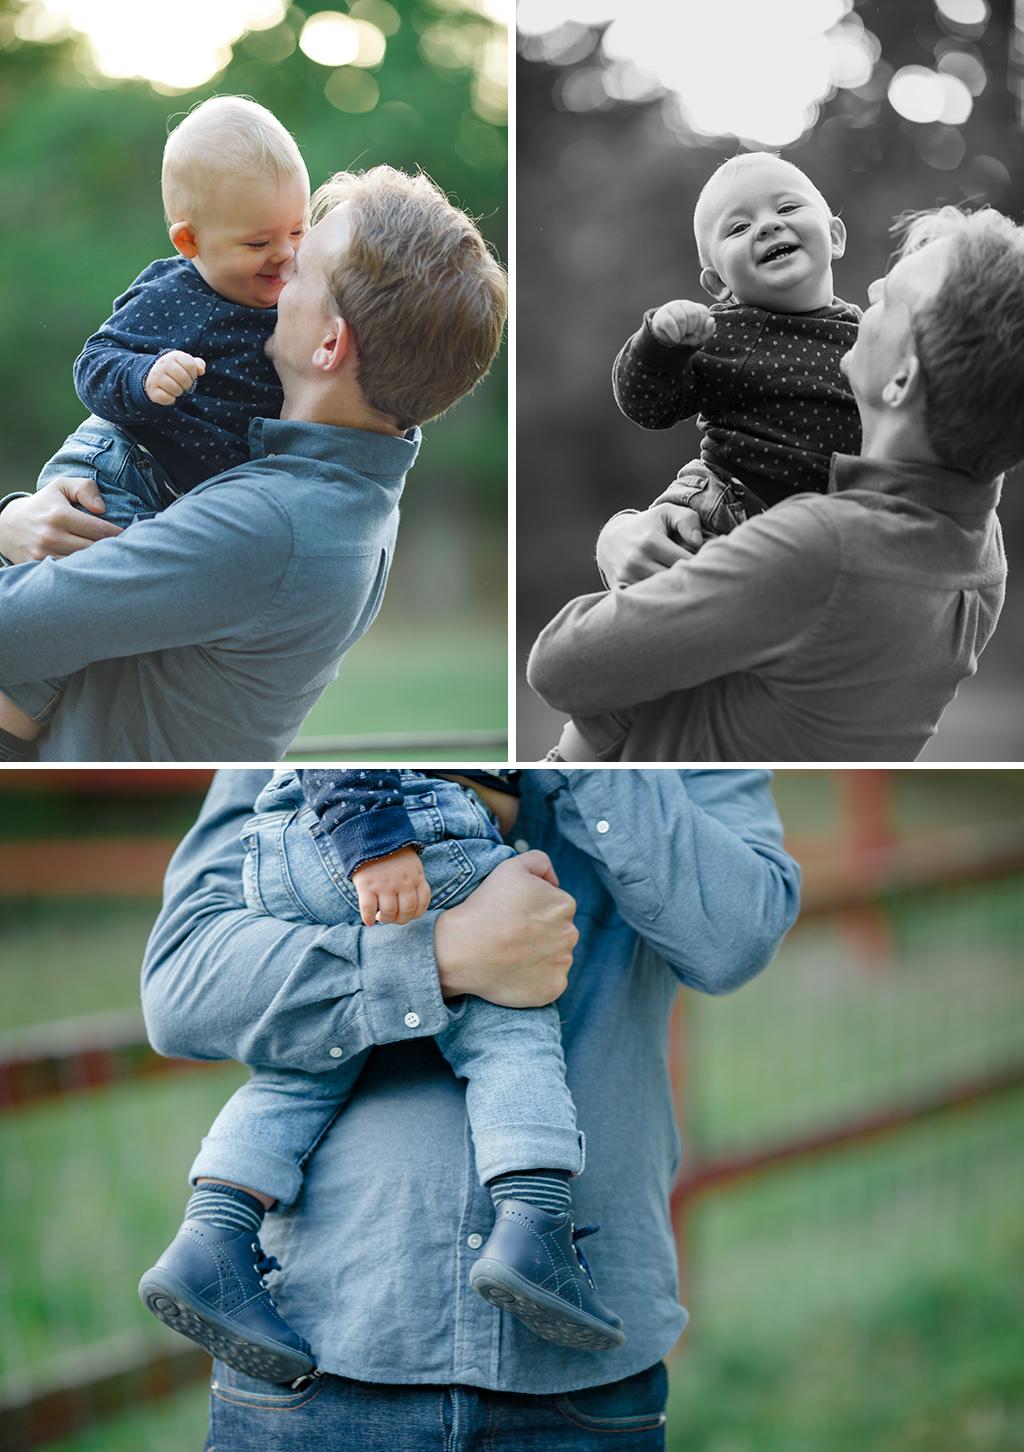 Familjefotografering_Stockholm_Familjefotograf-Anna-Sandstrom_9.jpg